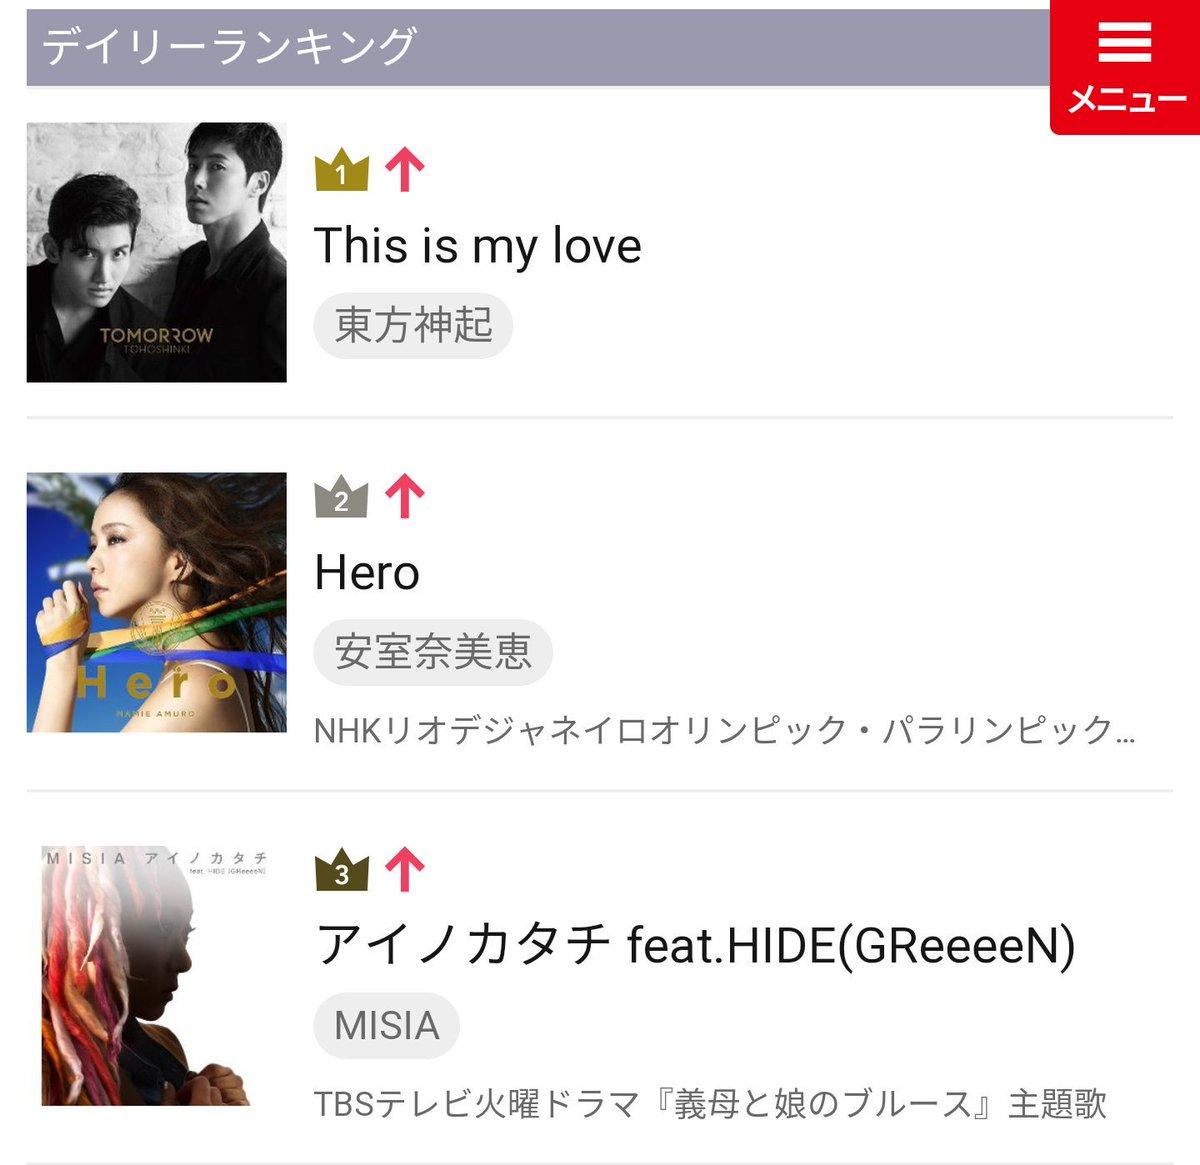 TVXQ charts 🌏 on Twitter: